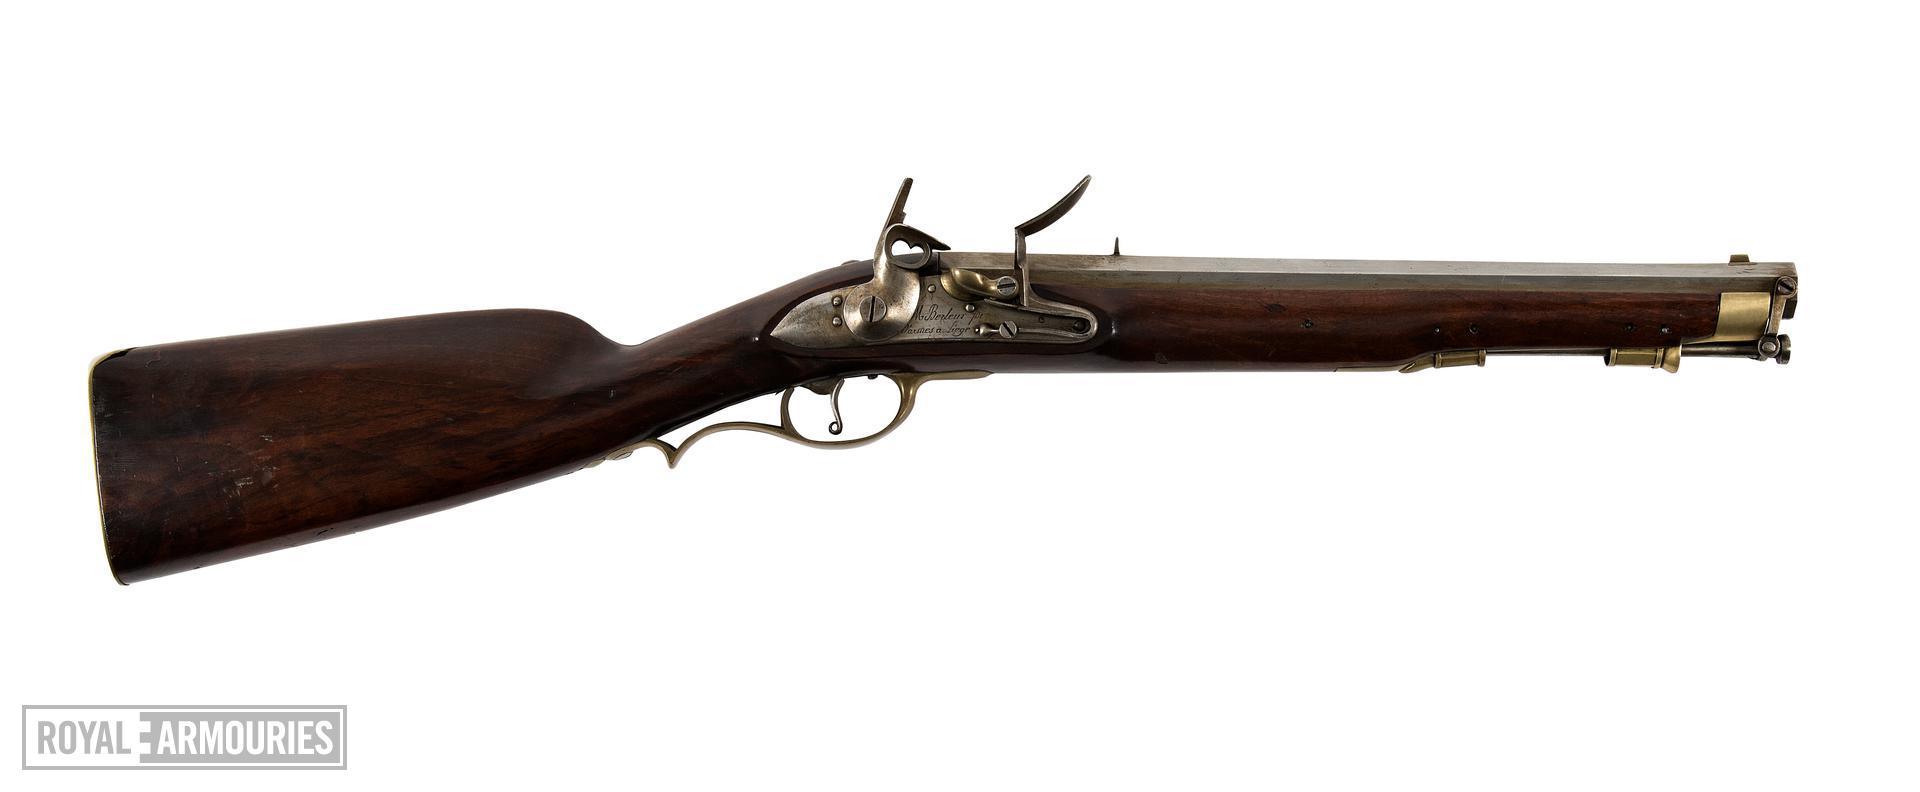 Flintlock muzzle-loading carbine - Carbine By Berleur